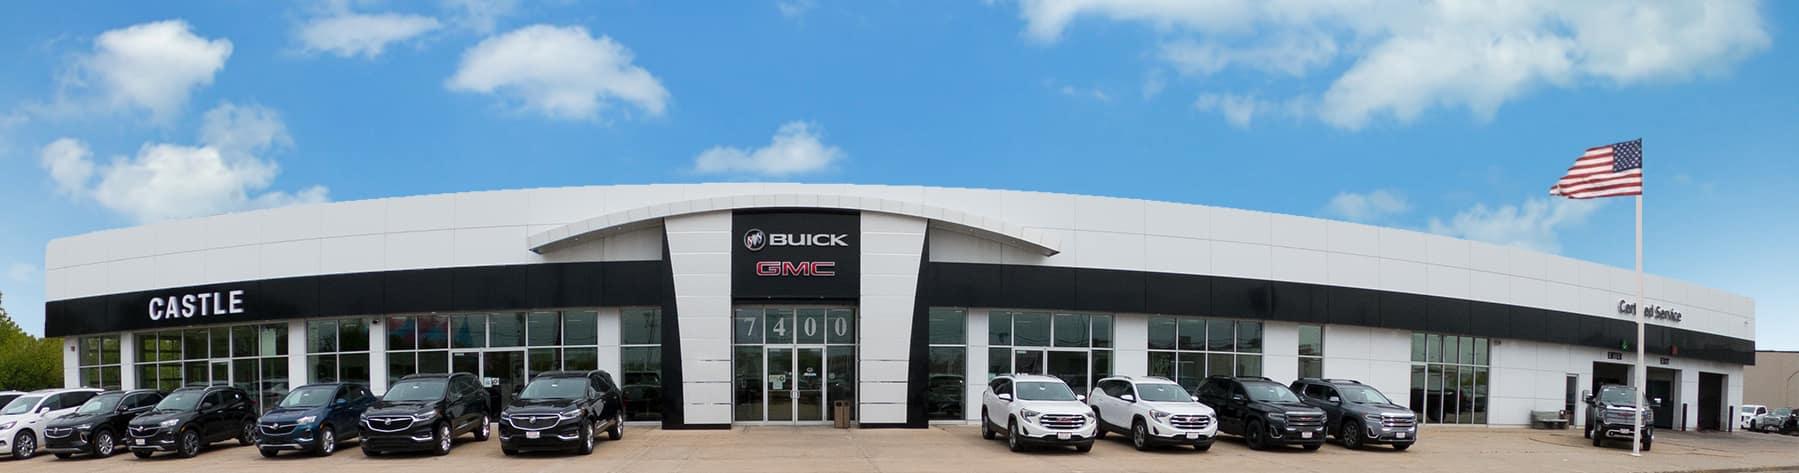 Castle Buick GMC Storefront